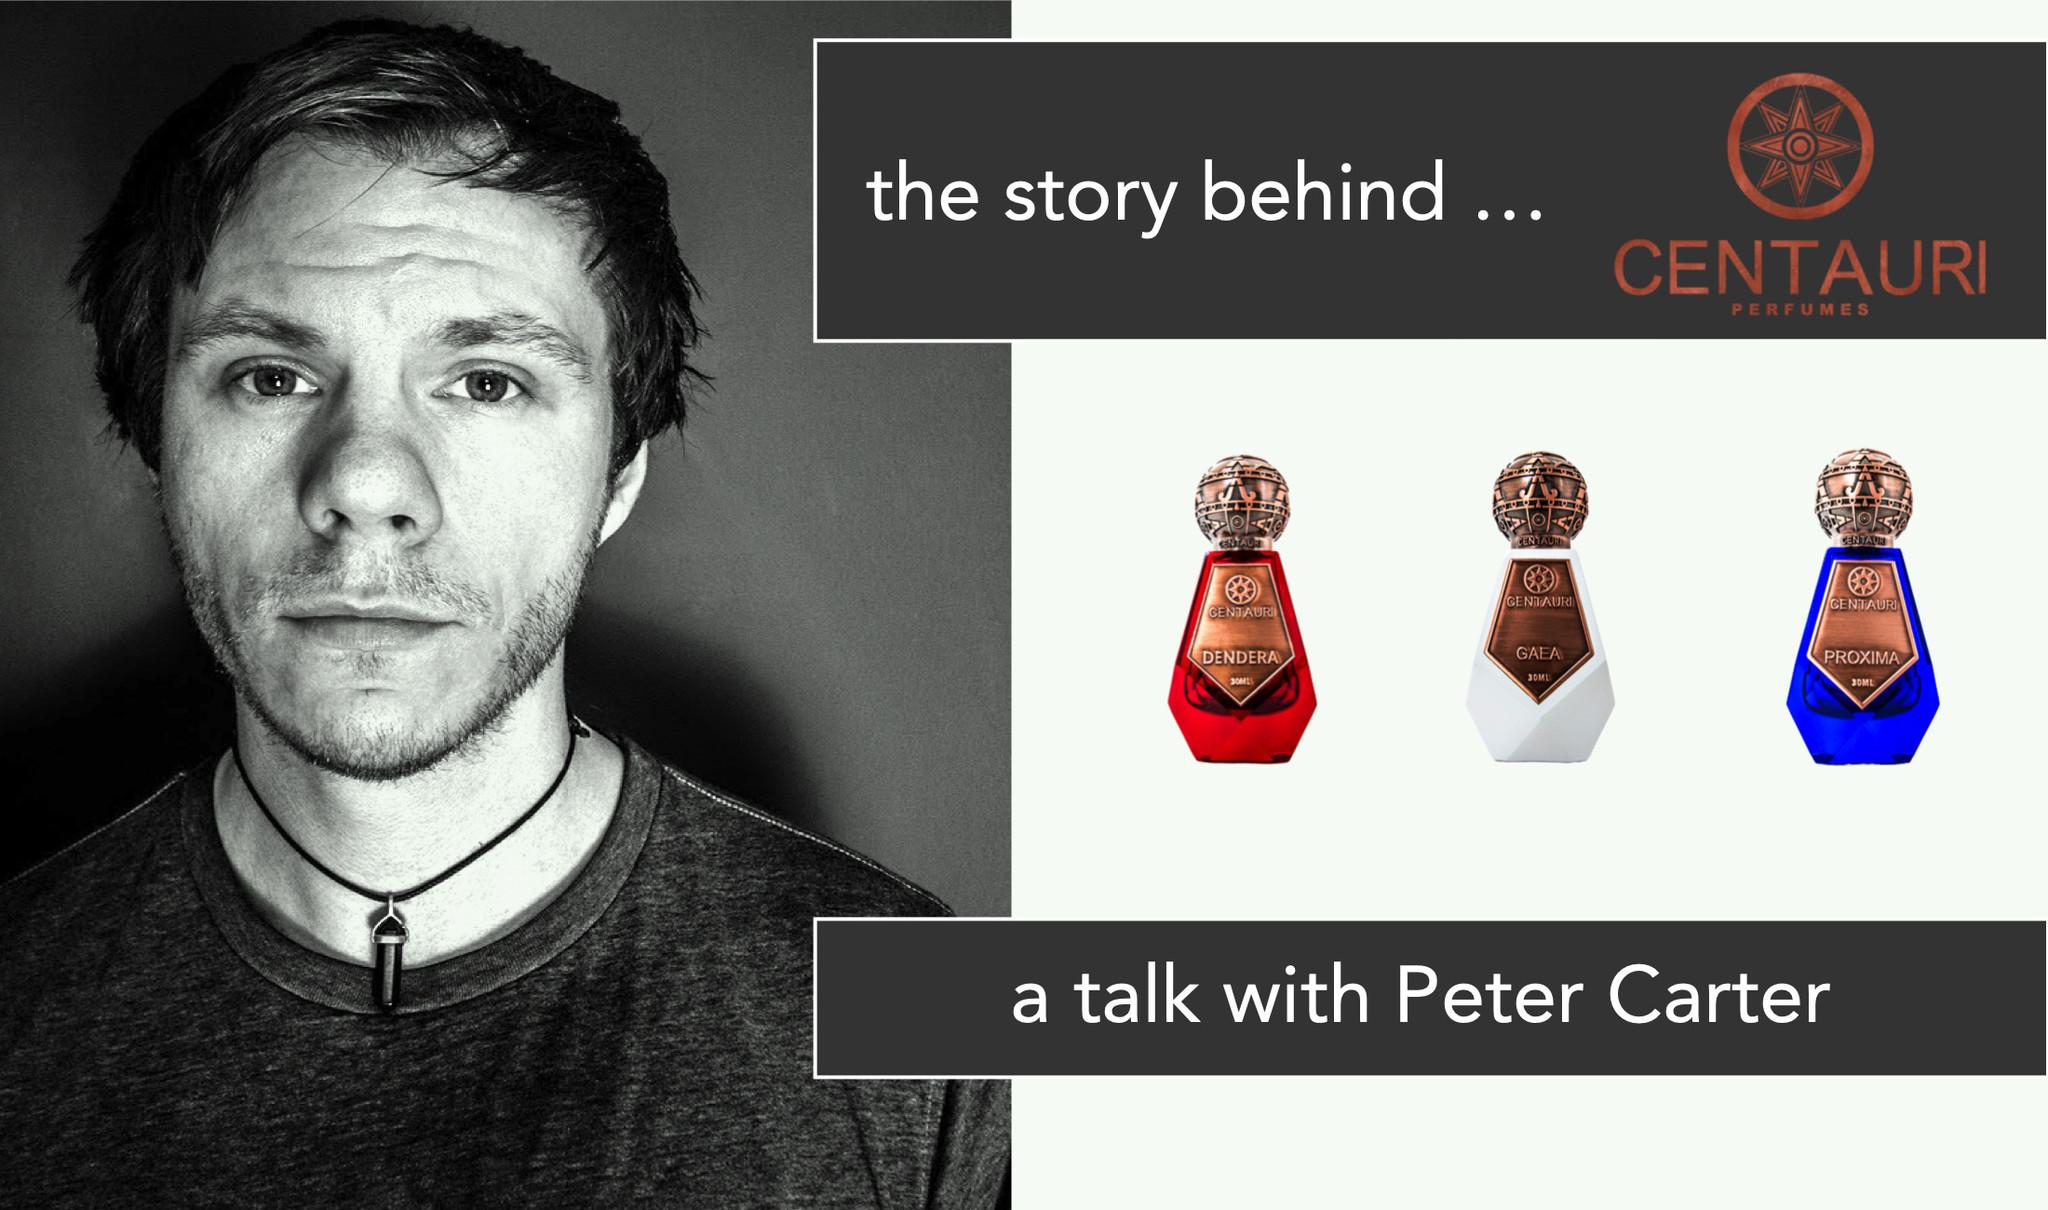 the story behind ... Centauri